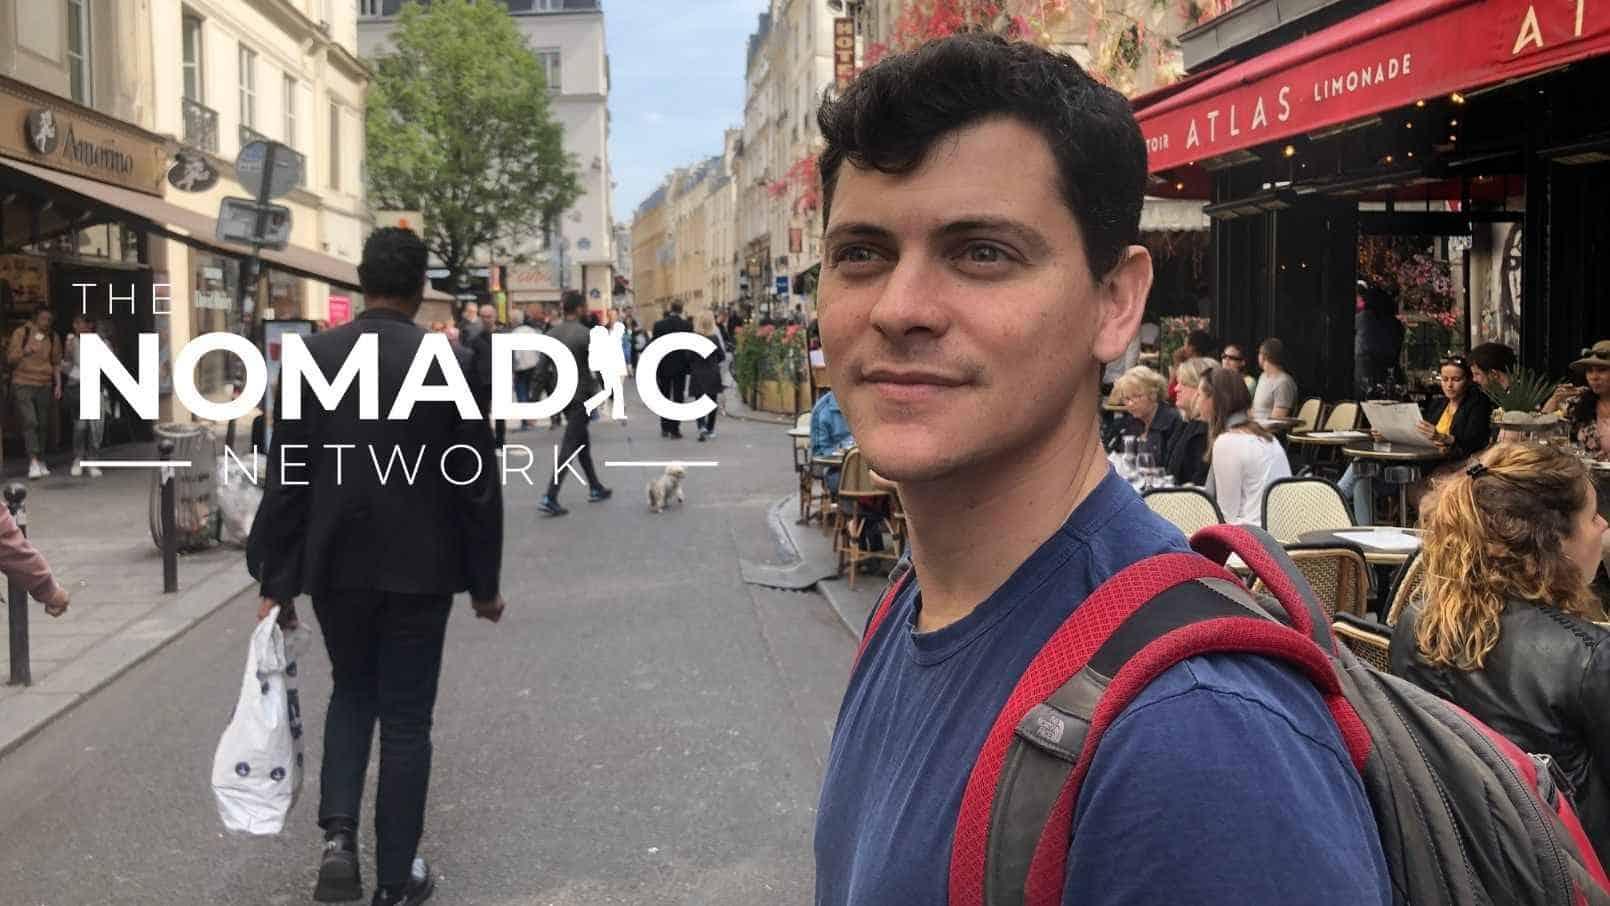 Nomadic Matt posing in Paris, France